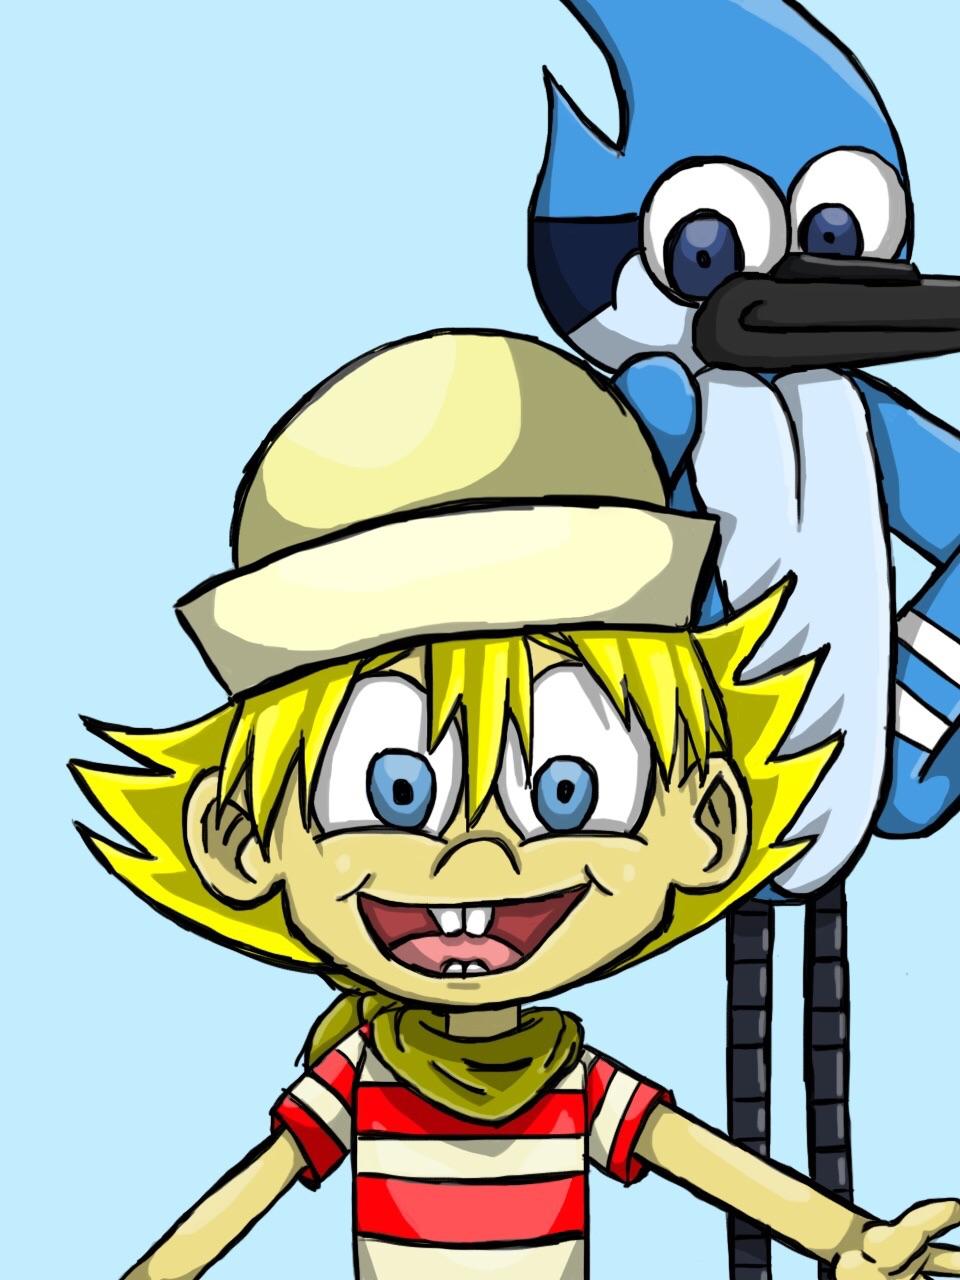 Flapjack and Mordecai fan art by SailorSeiyaDigiJem